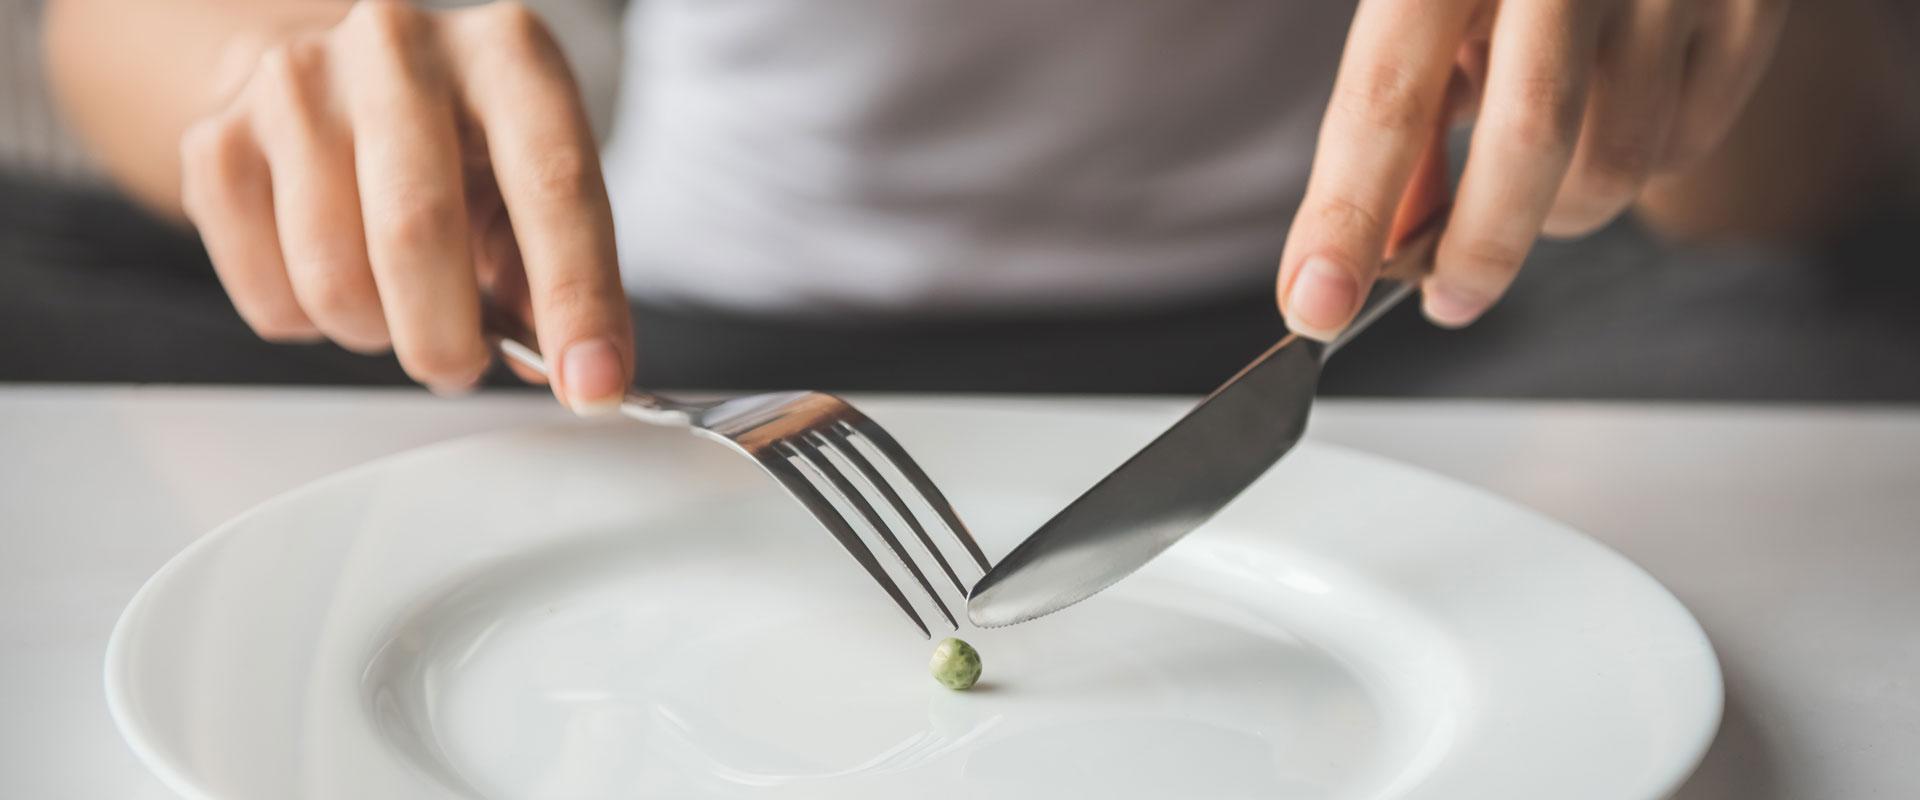 Ratgeber zur Notfallvorsorge - Lebensmittel